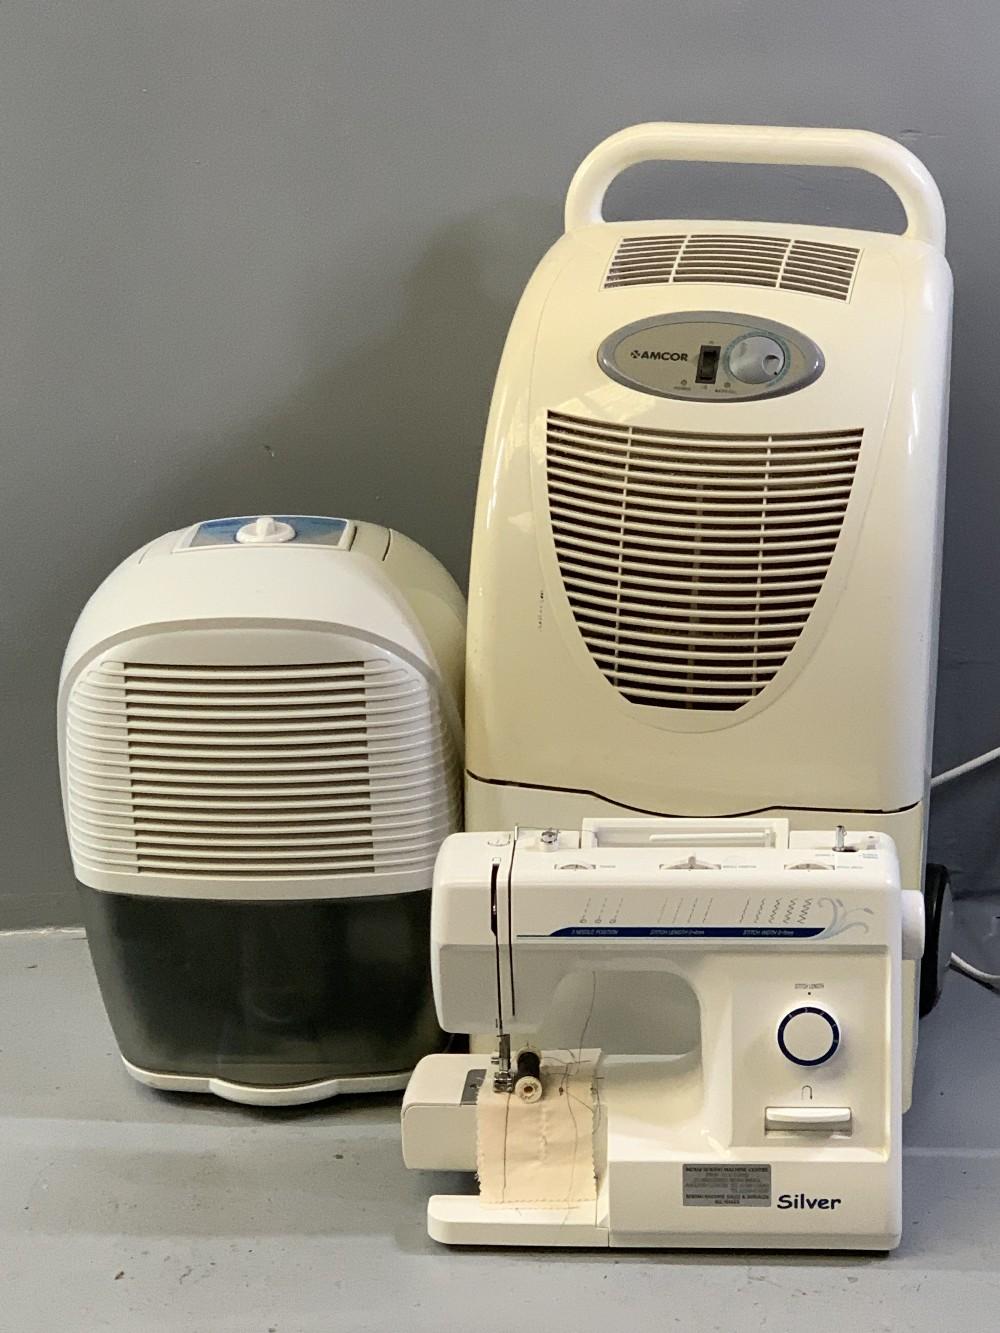 AMCOR TROLLEY DEHUMIDIFIER, a Delonghi portable dehumidifier and a modern electric sewing machine